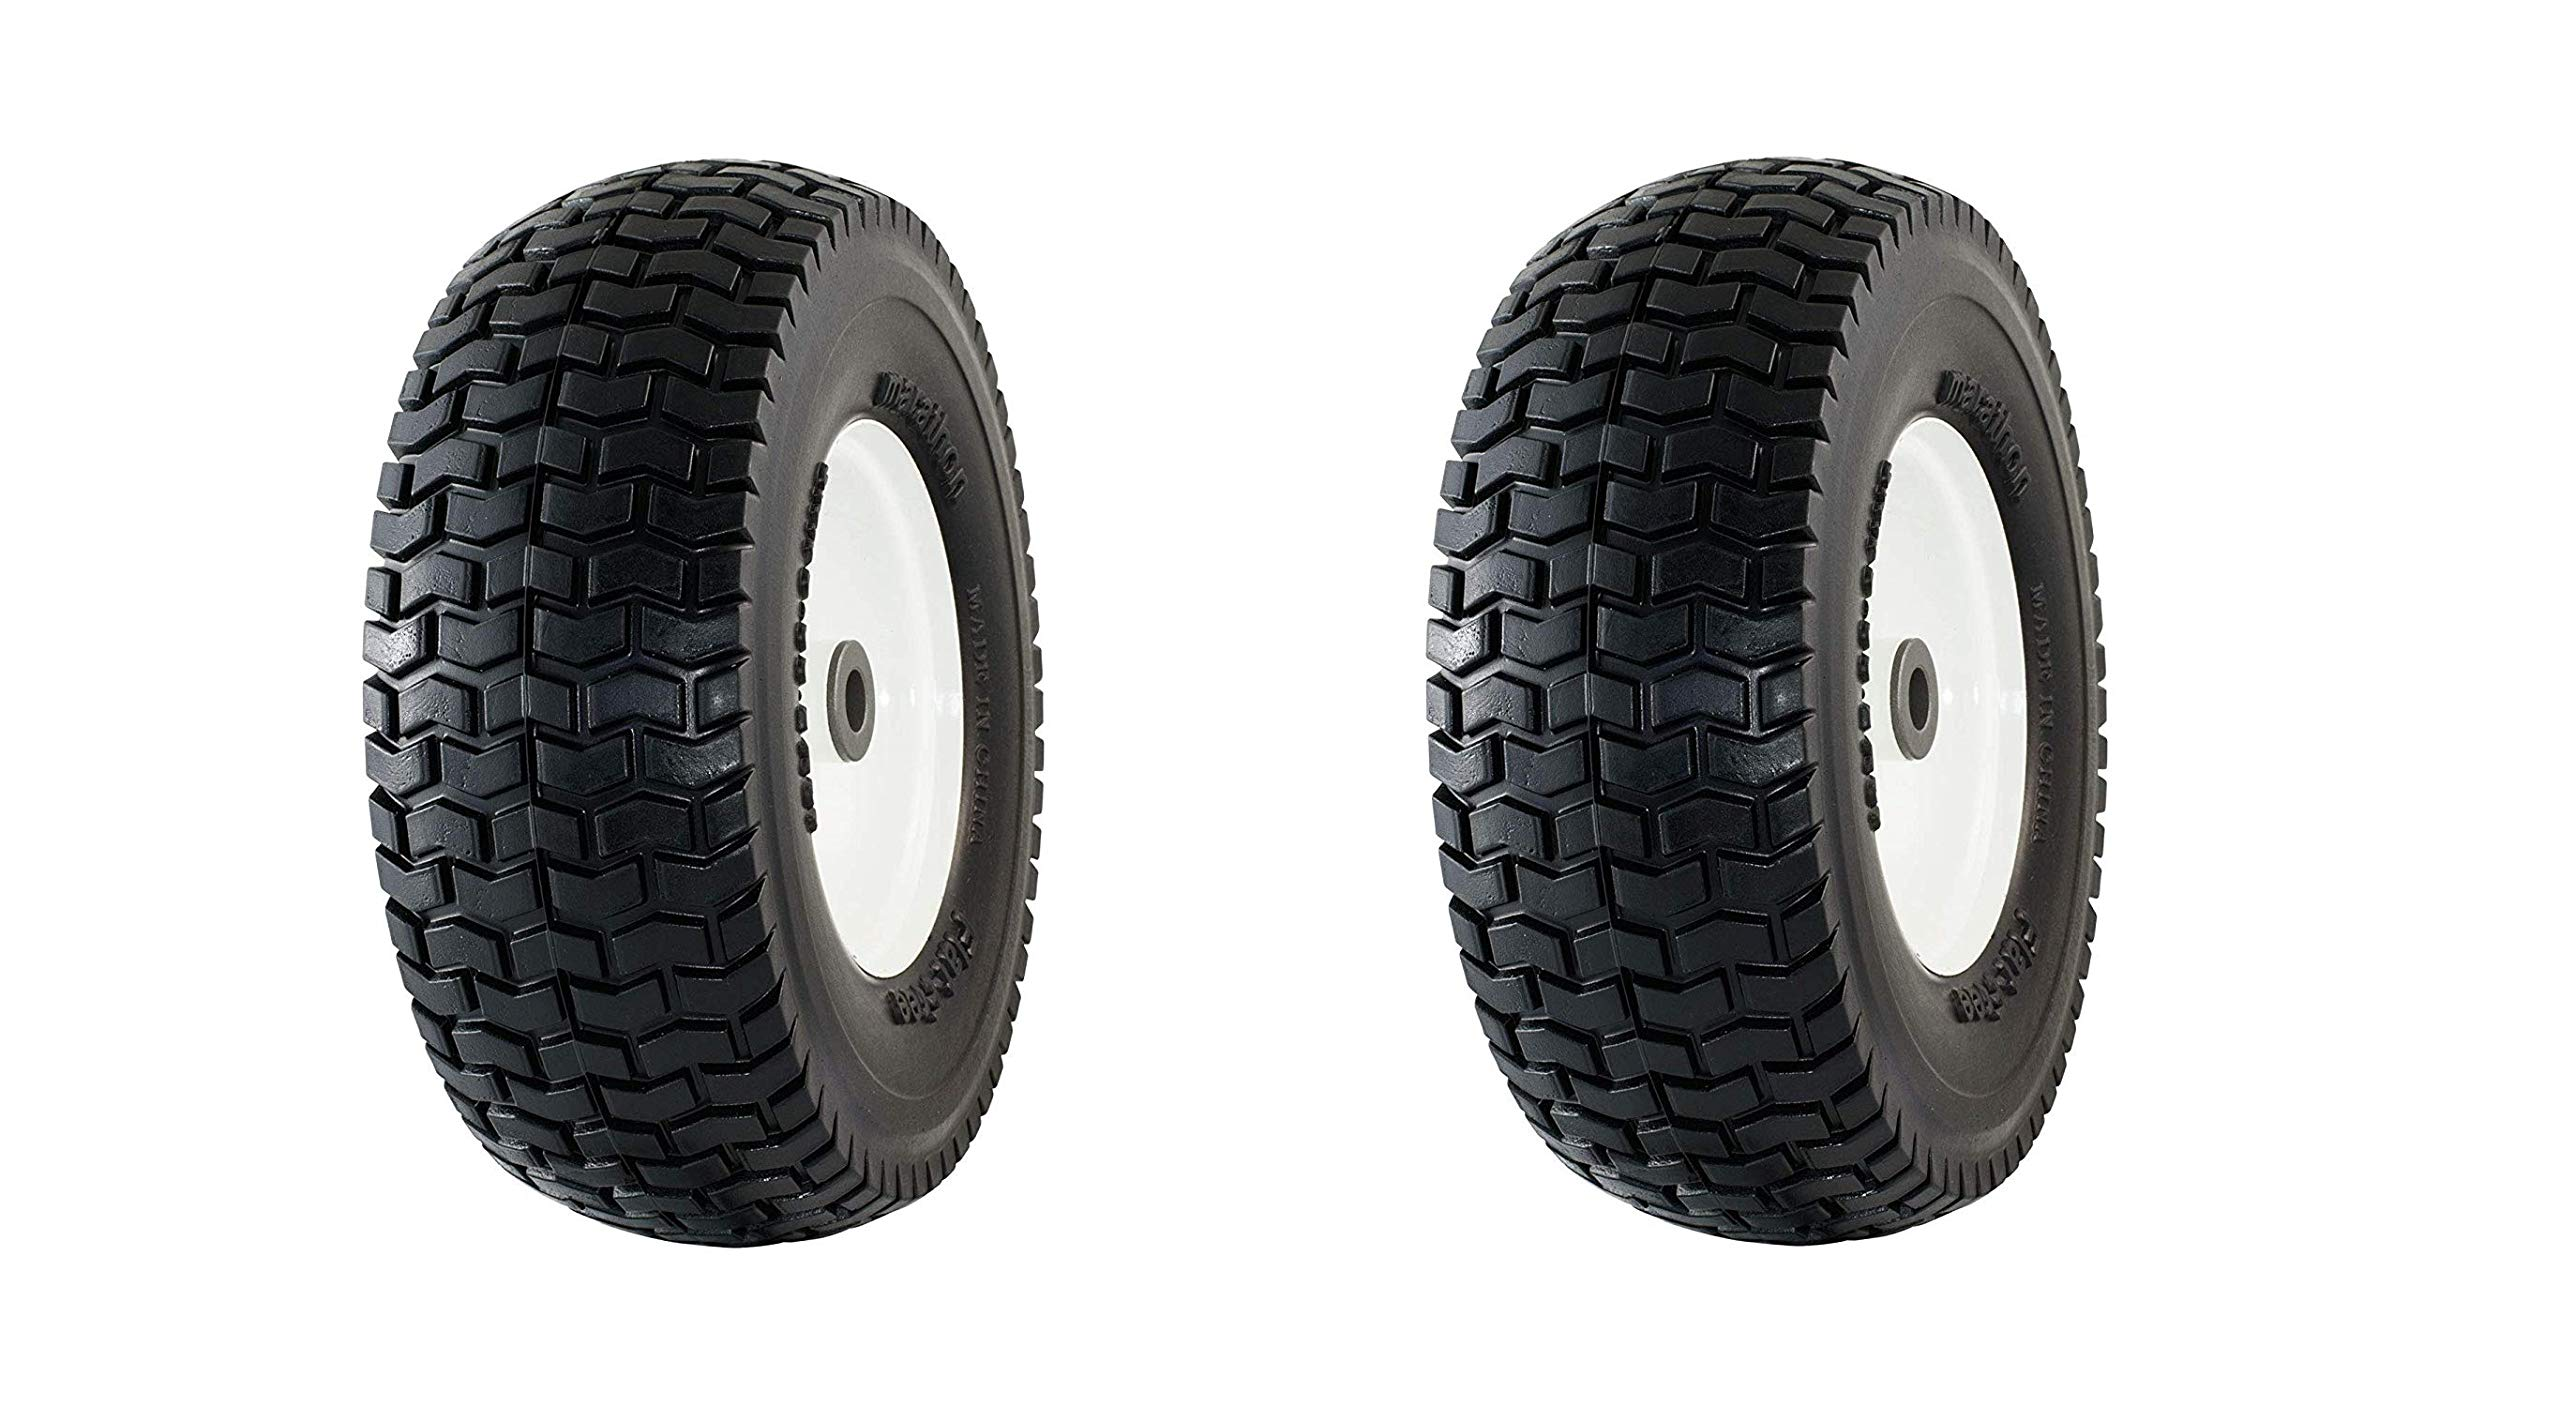 Marathon 13x5.00-6'' Flat Free Tire on Wheel, 3'' Hub, 3/4'' Bushings (Pack of 2) by Marathon Industries